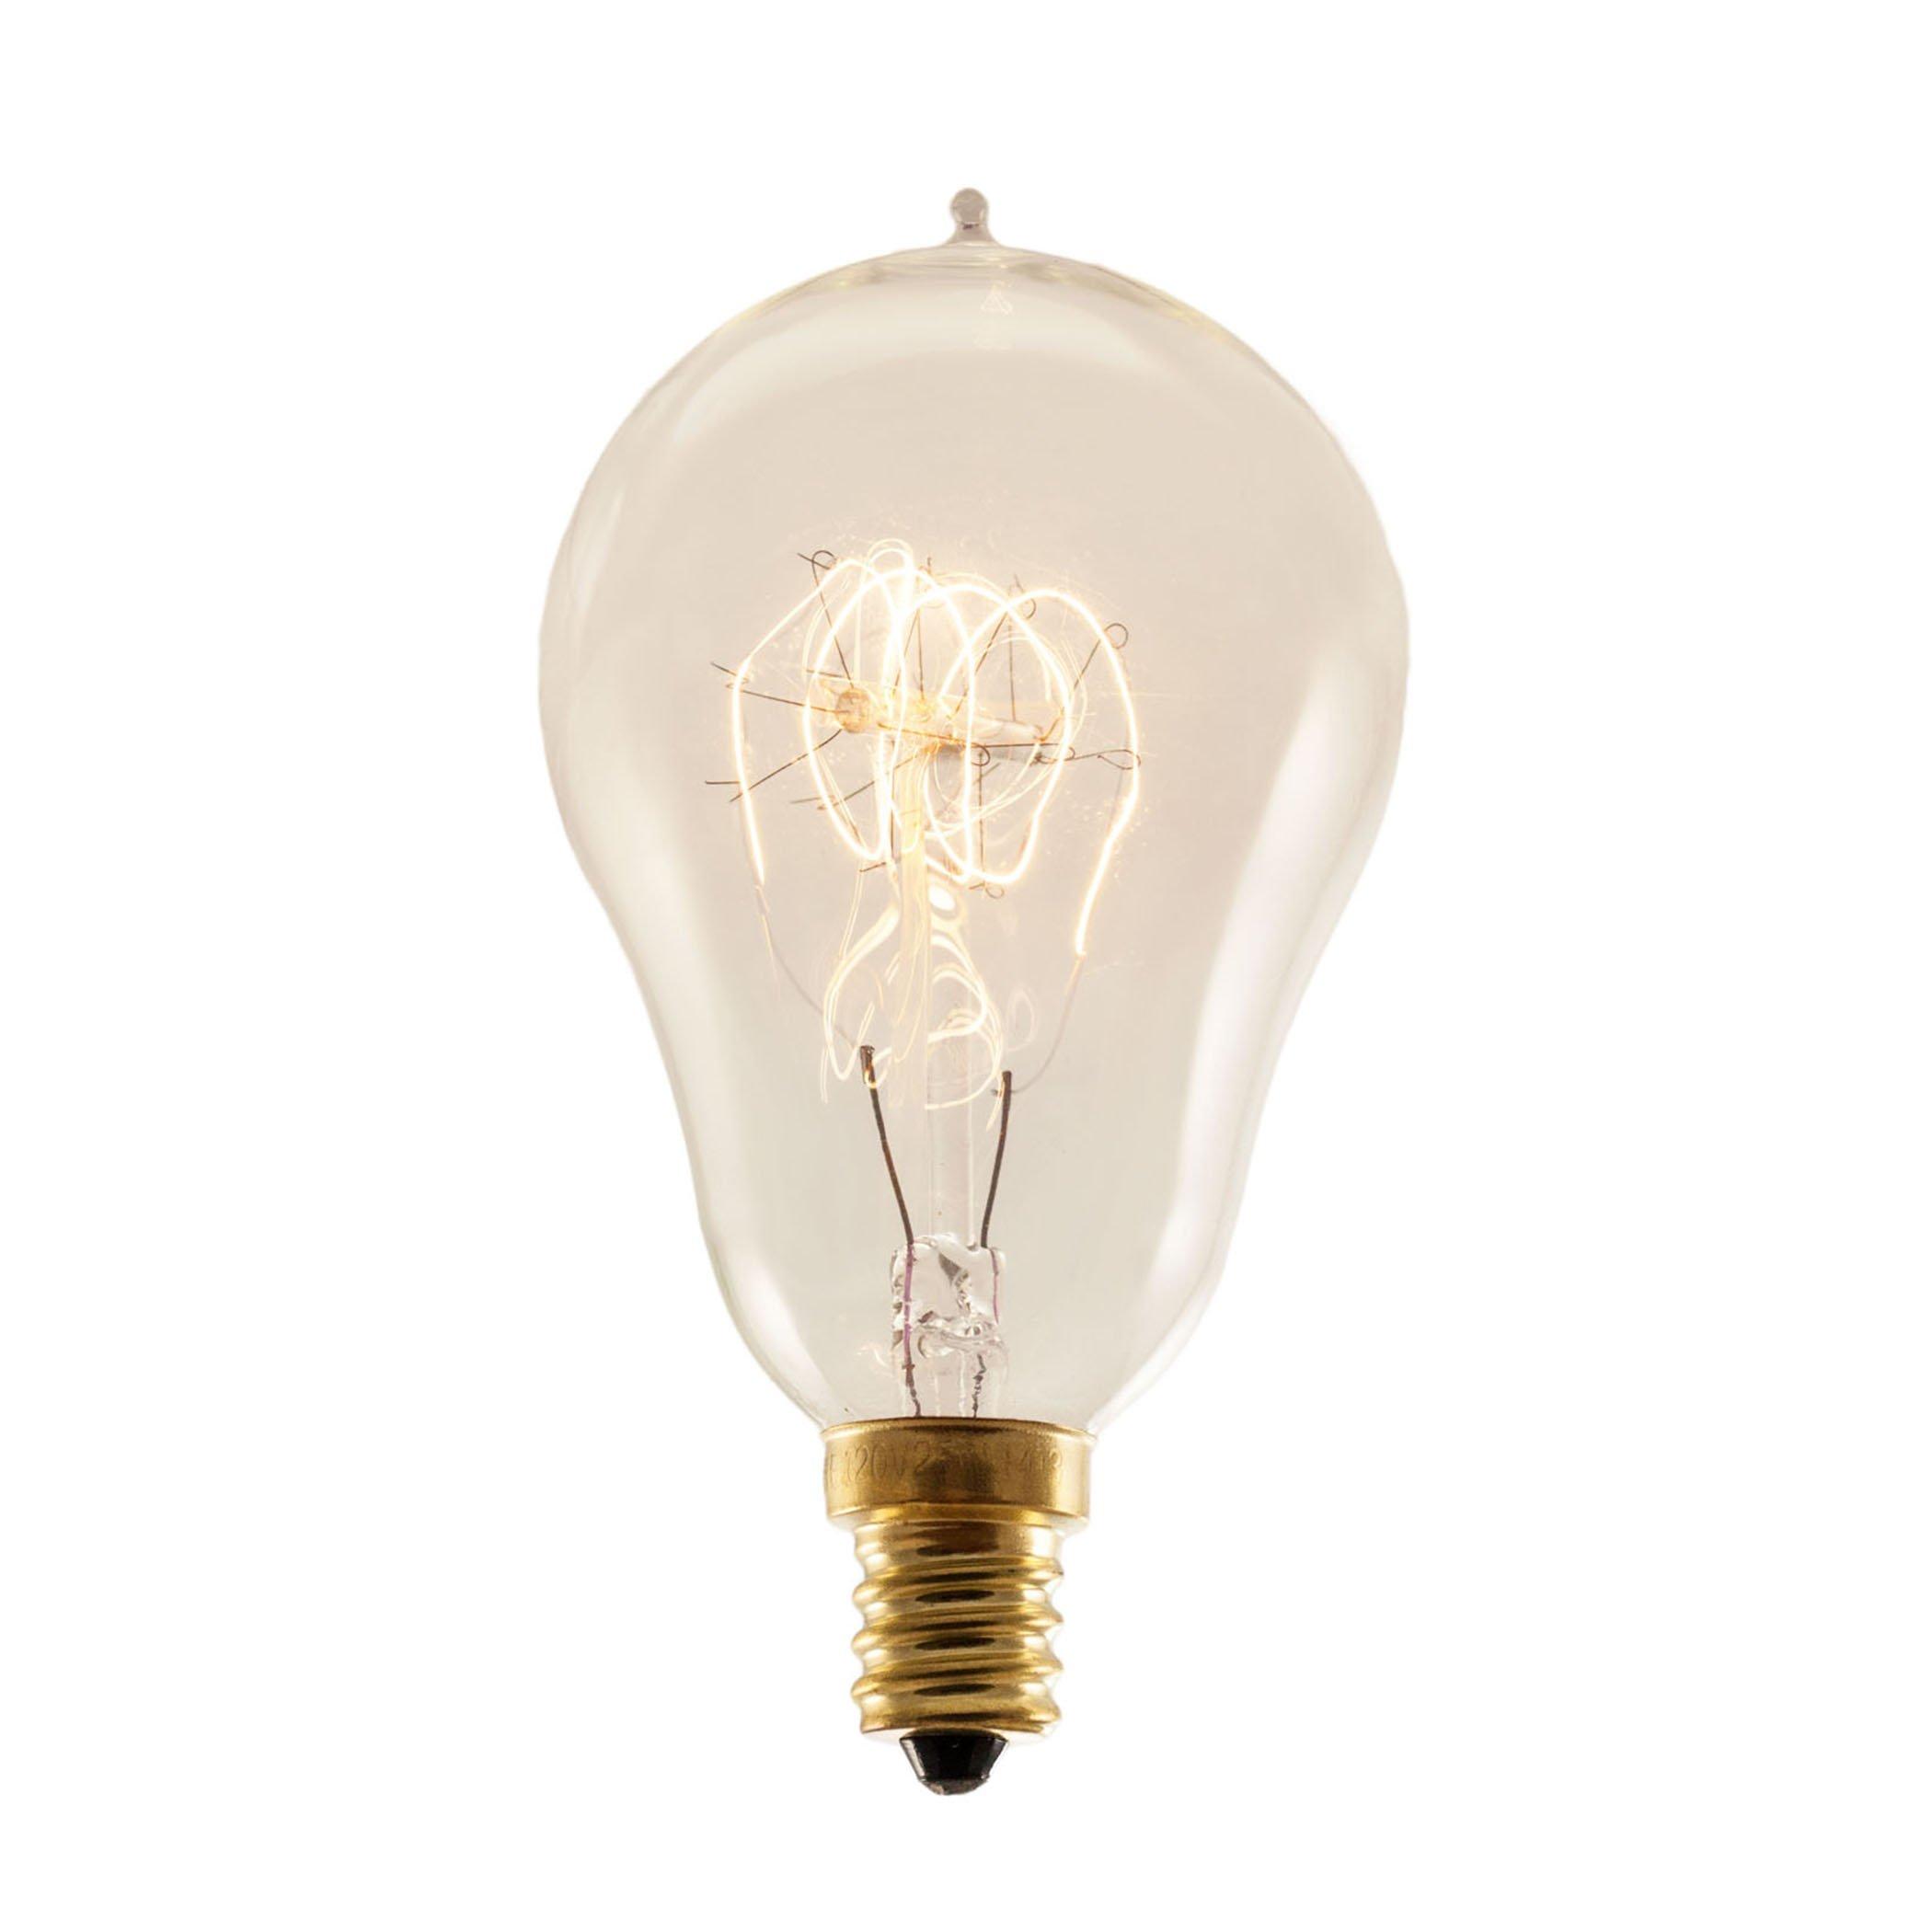 10 Qty. Bulbrite NOS25A15/LP/E12 25-Watt Nostalgic Incandescent Edison A15, Vintage Loop Filament, Candelabra Base, Antique Bulb